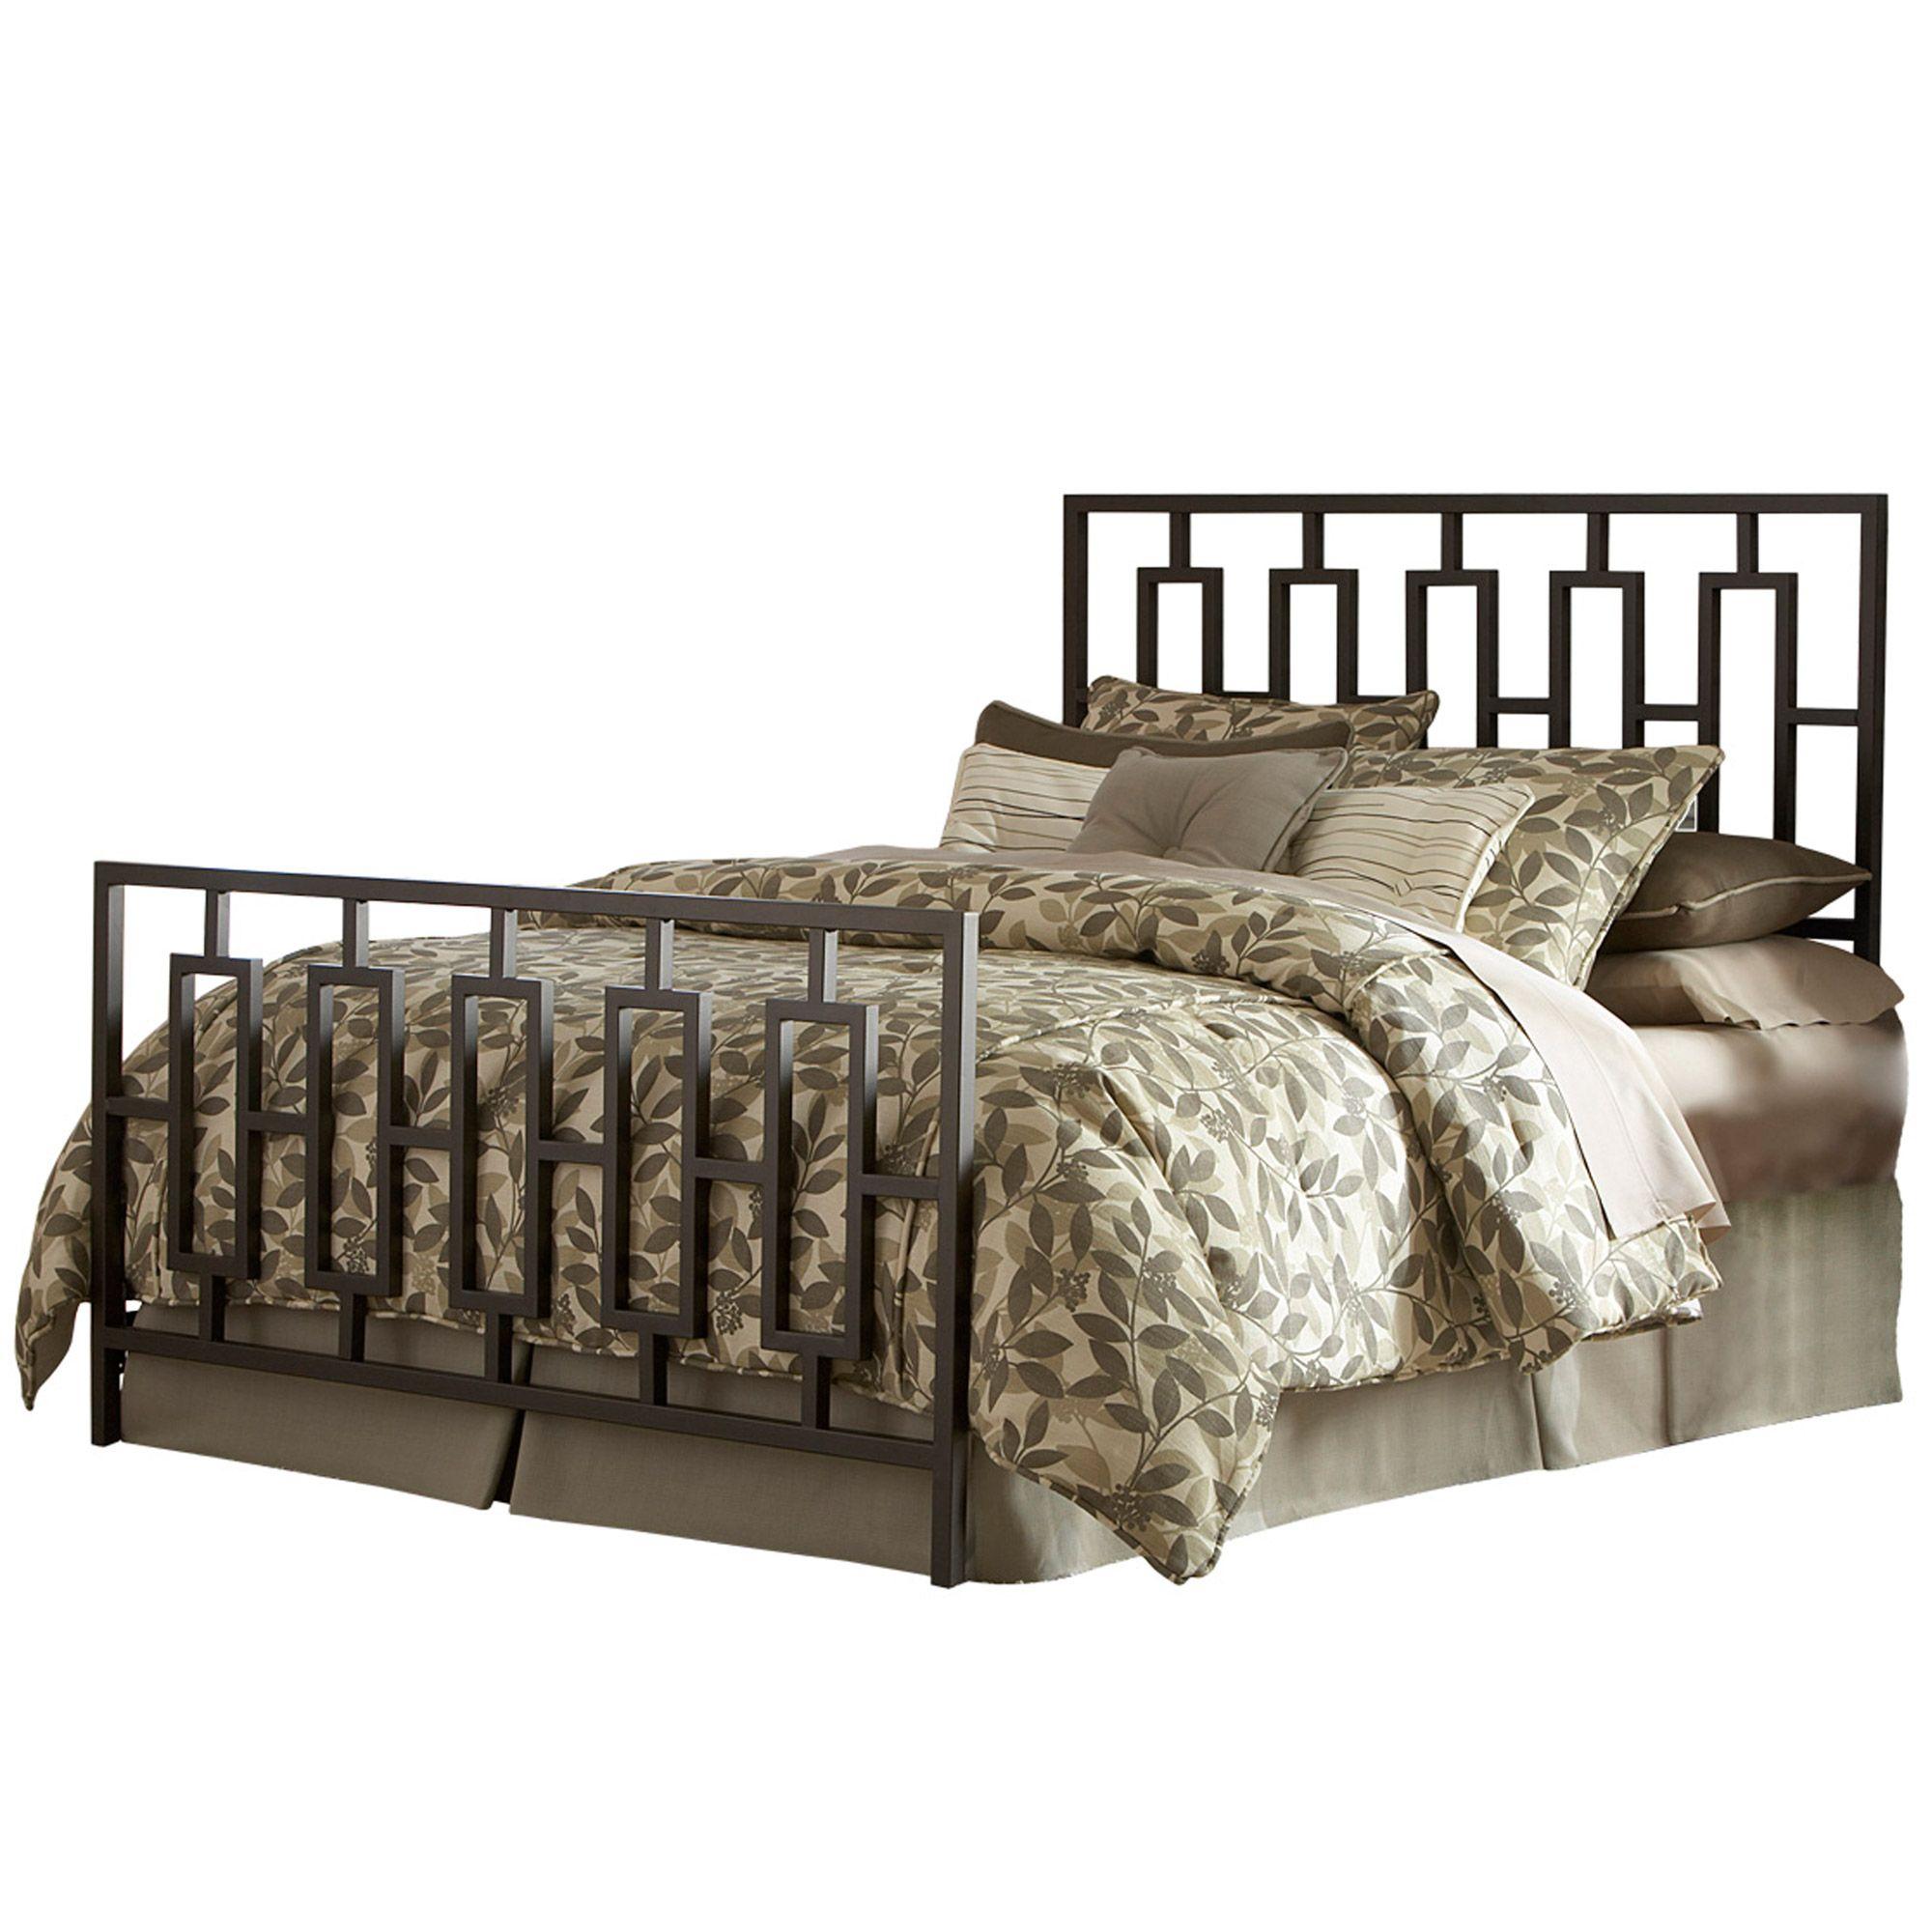 Best Miami Iron Bed Sleek Contemporary Design Coffee Finish 640 x 480